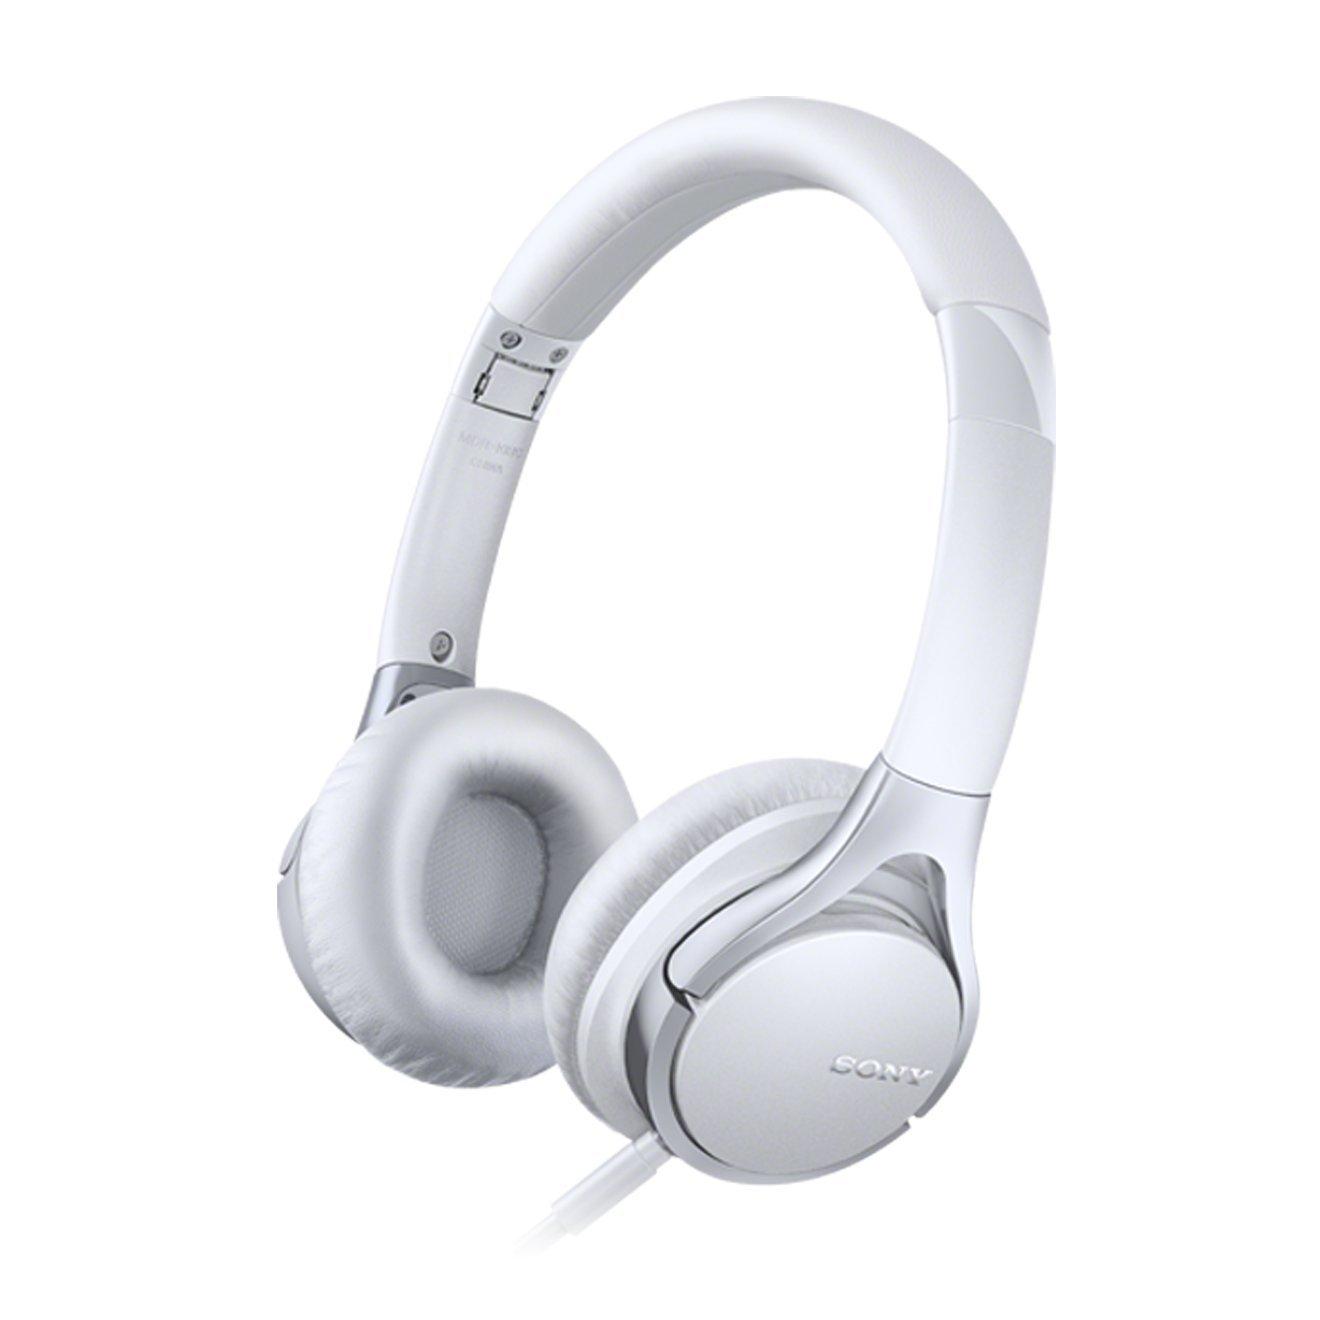 Sony MDR-10RC faltbarer High Resolution Kopfhörer: Amazon.de: Elektronik